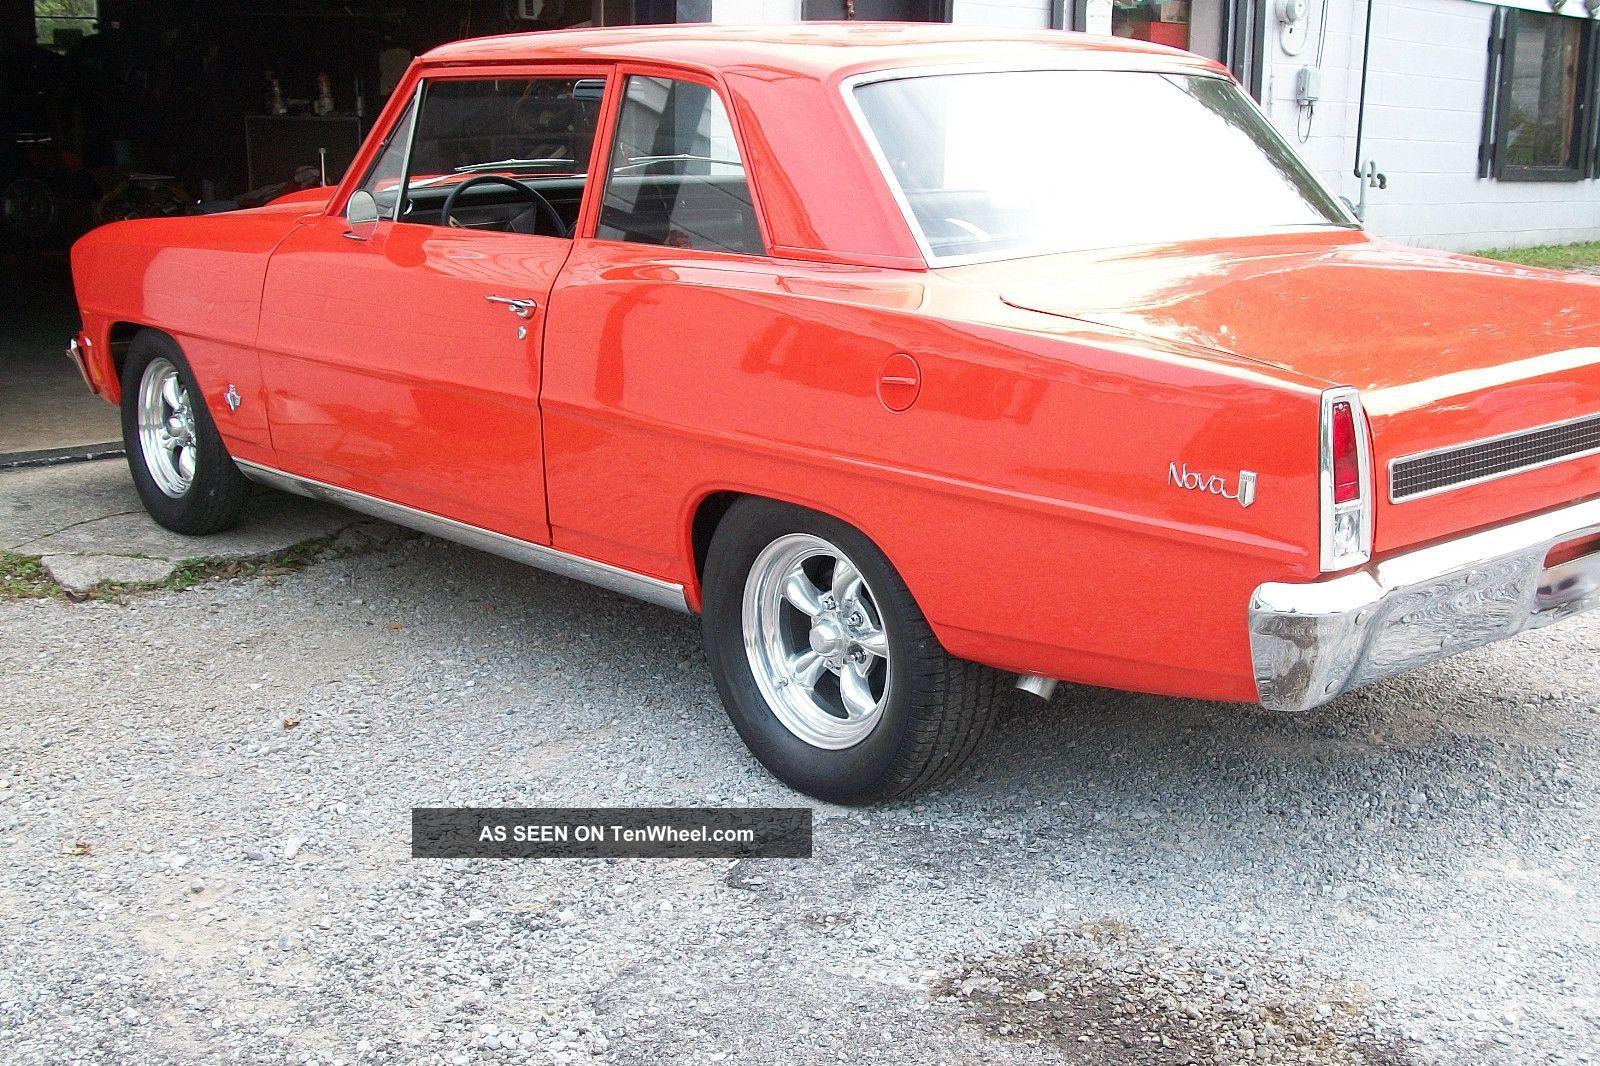 1967 Chevy Ii Nova 2 Dr Street Fast Car - Quick Hugger Orange Nova photo